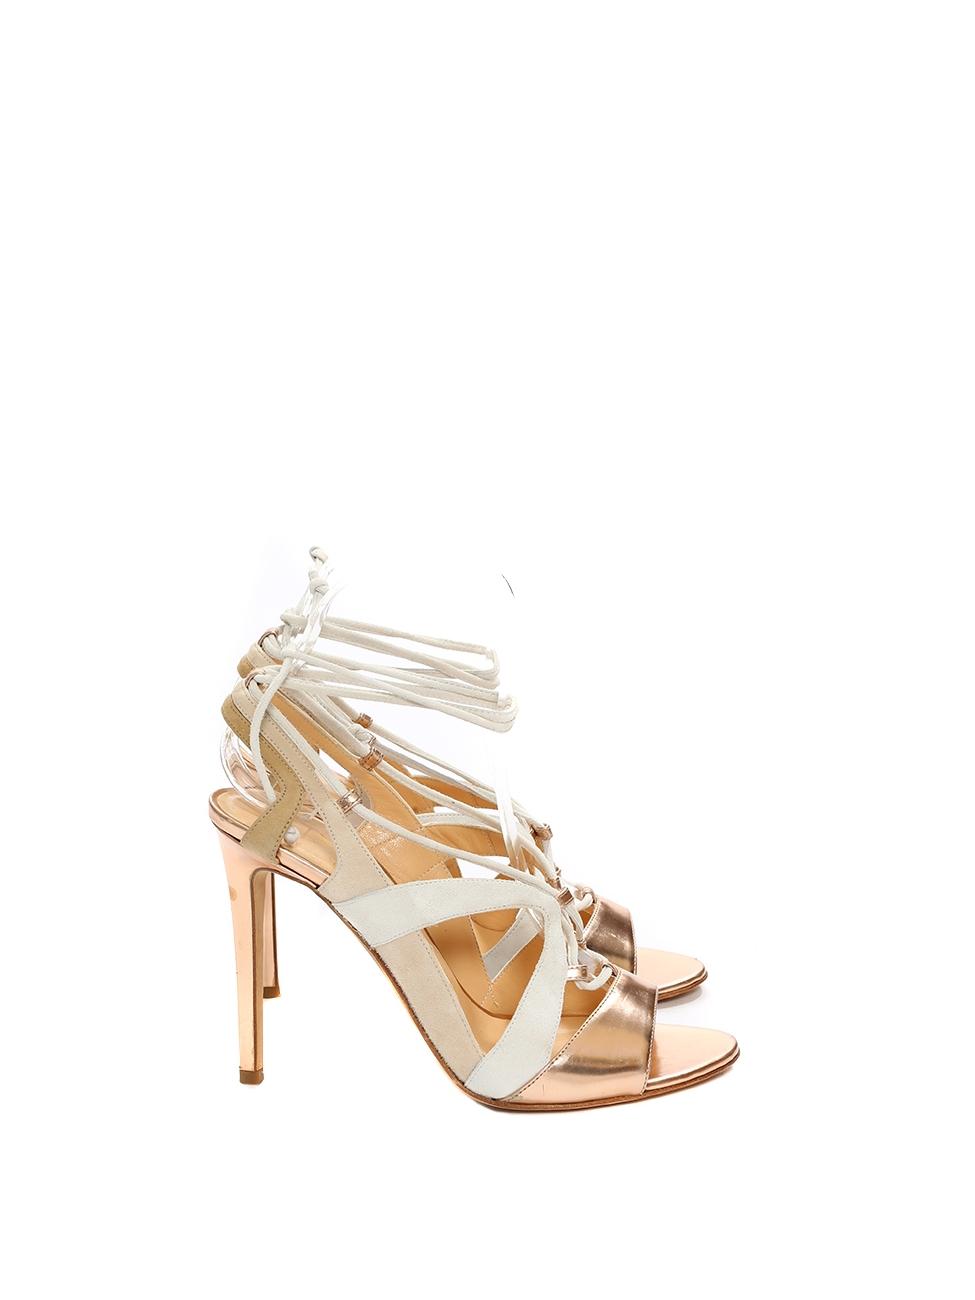 34e9735a740 Louise Paris - ALEJANDRO INGELMO FRANCA Pink gold metallic leather ...